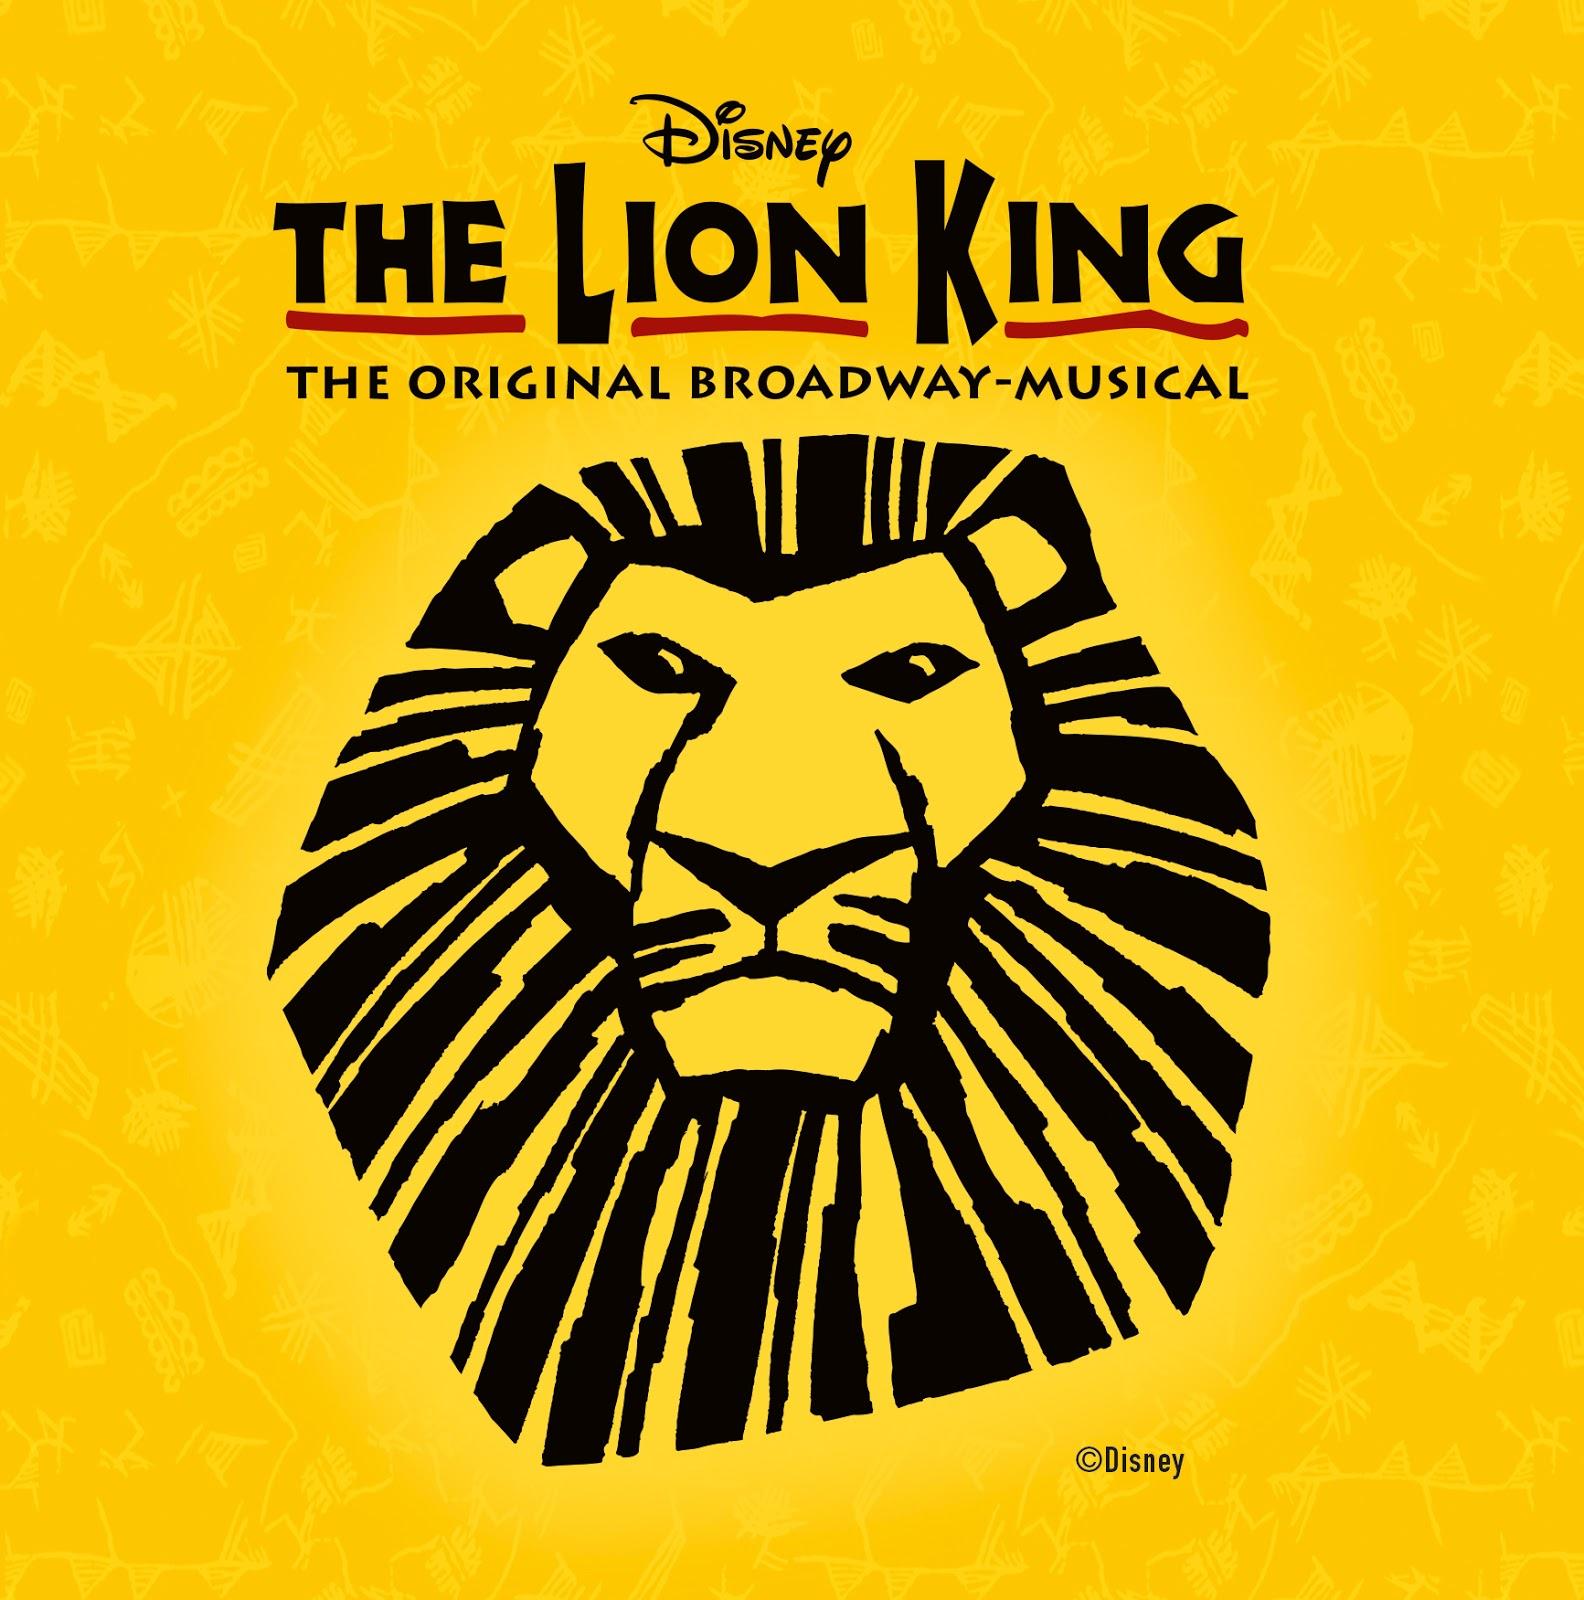 cc u0026 39 s lifestyle  the lion king musical